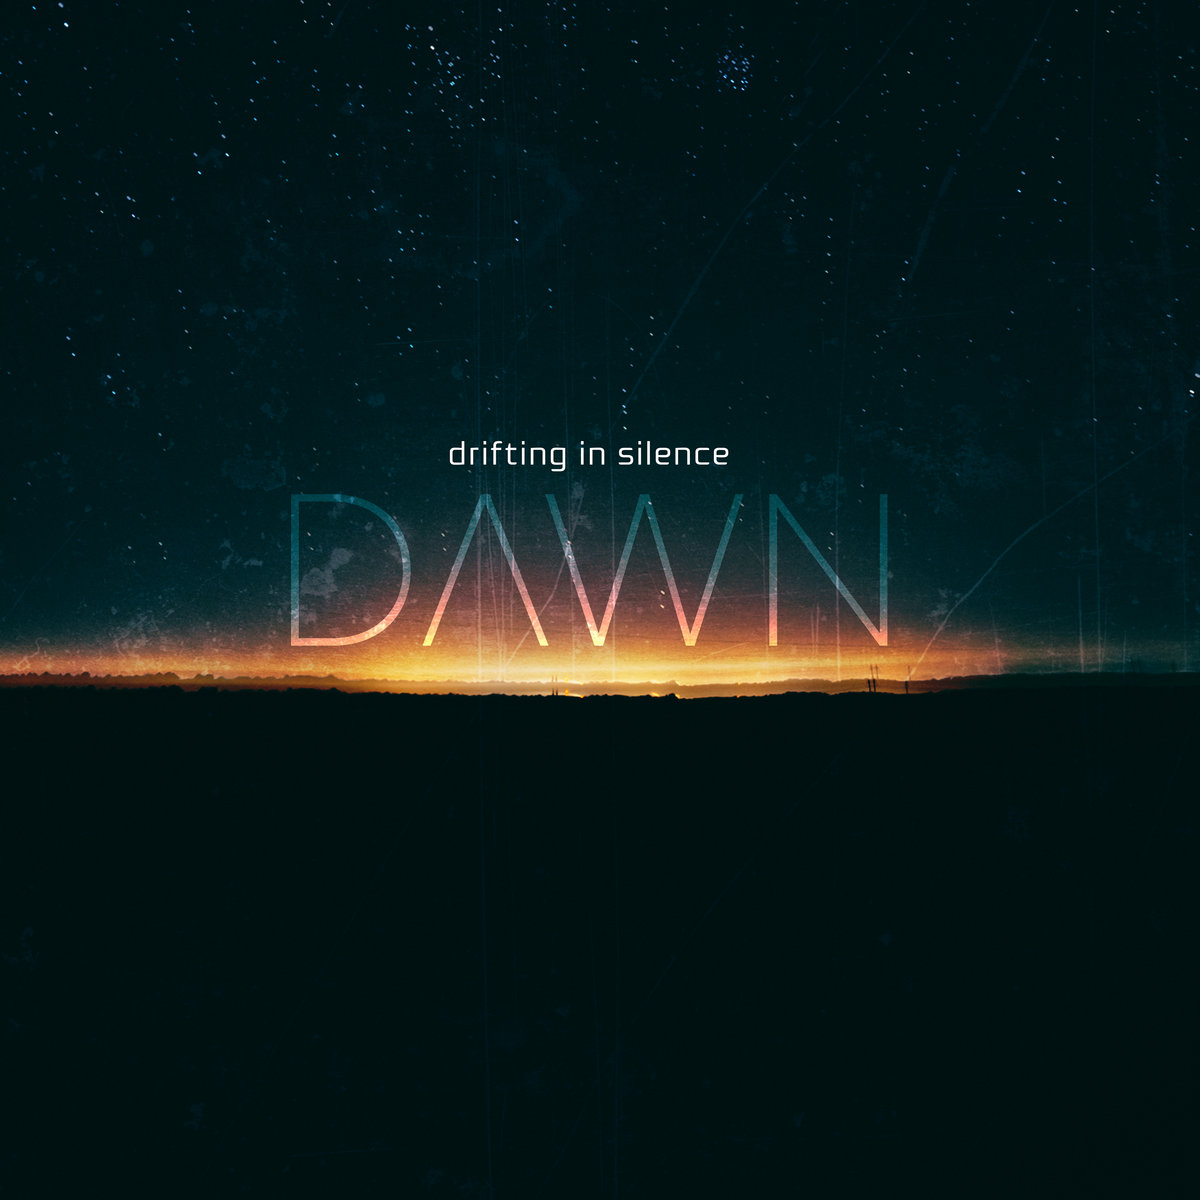 dawn drifting in silence